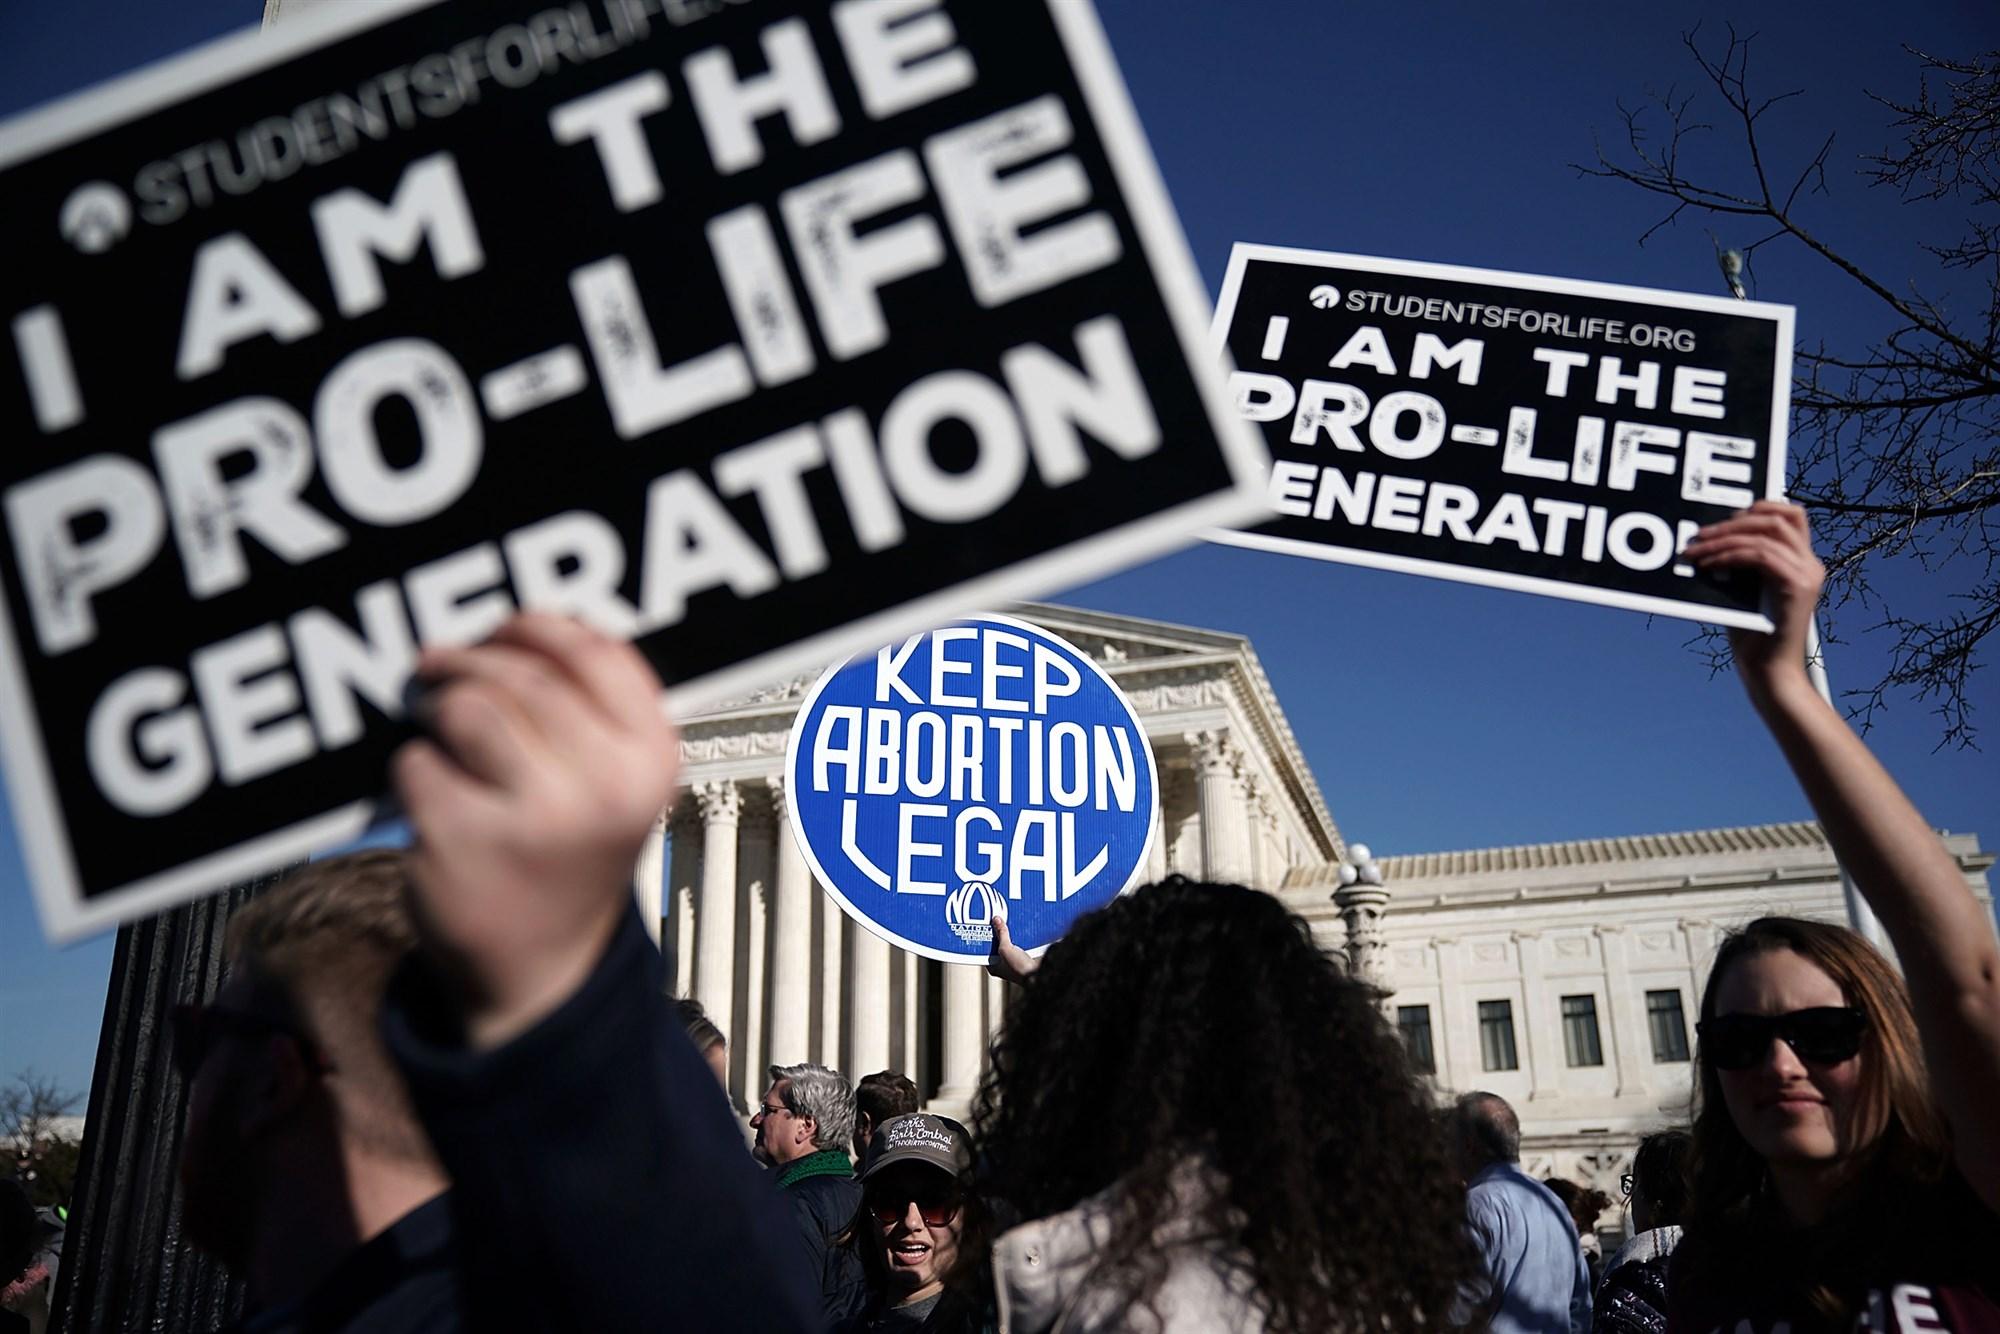 abortion_1549594841183.jpg